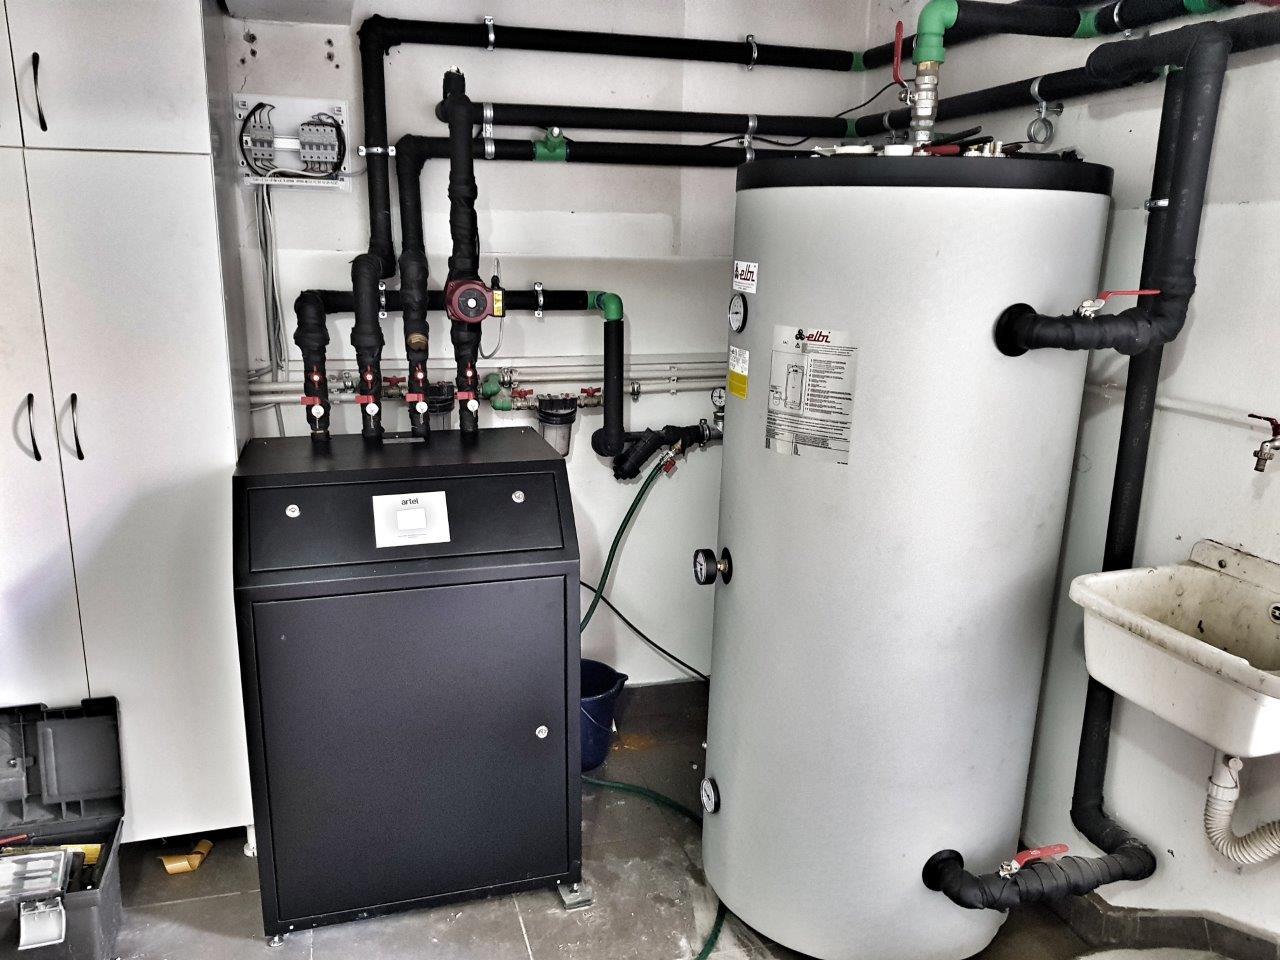 Toplotna-pumpa-ARTEL-HP-16HC-HT-u-tehnickom-prosotru